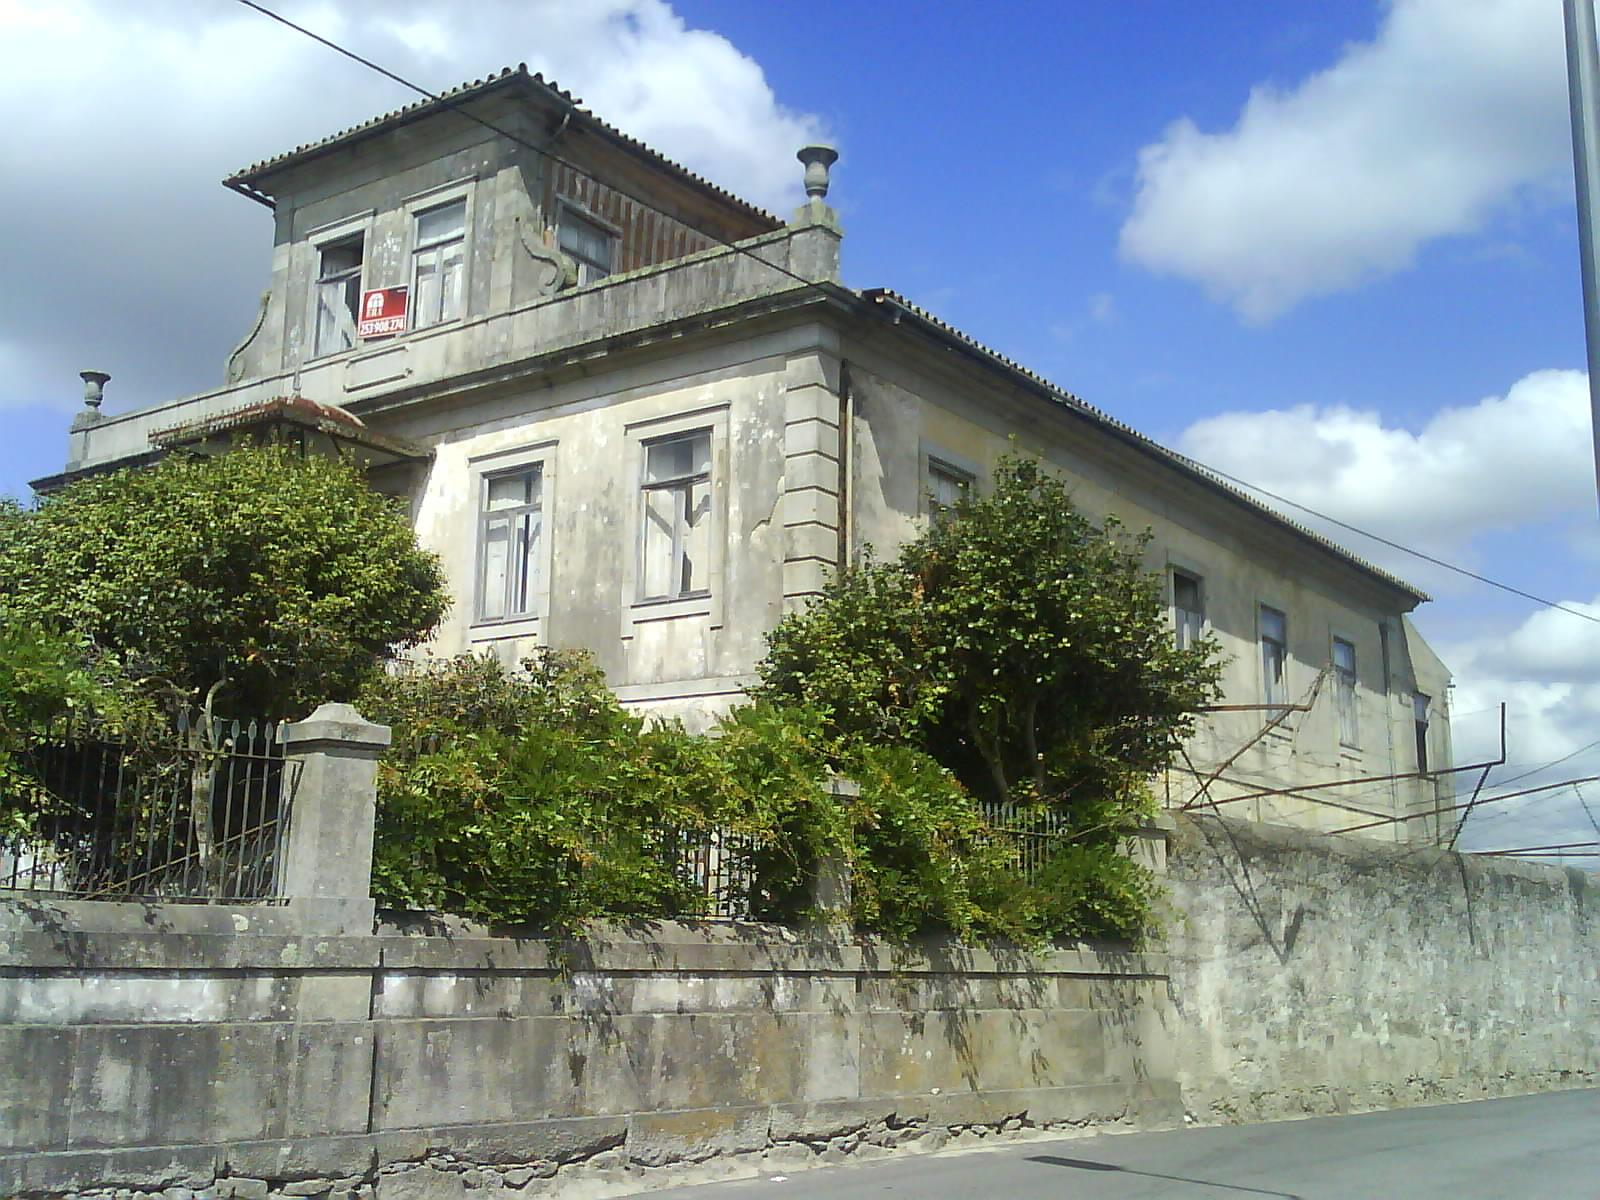 Casa braga